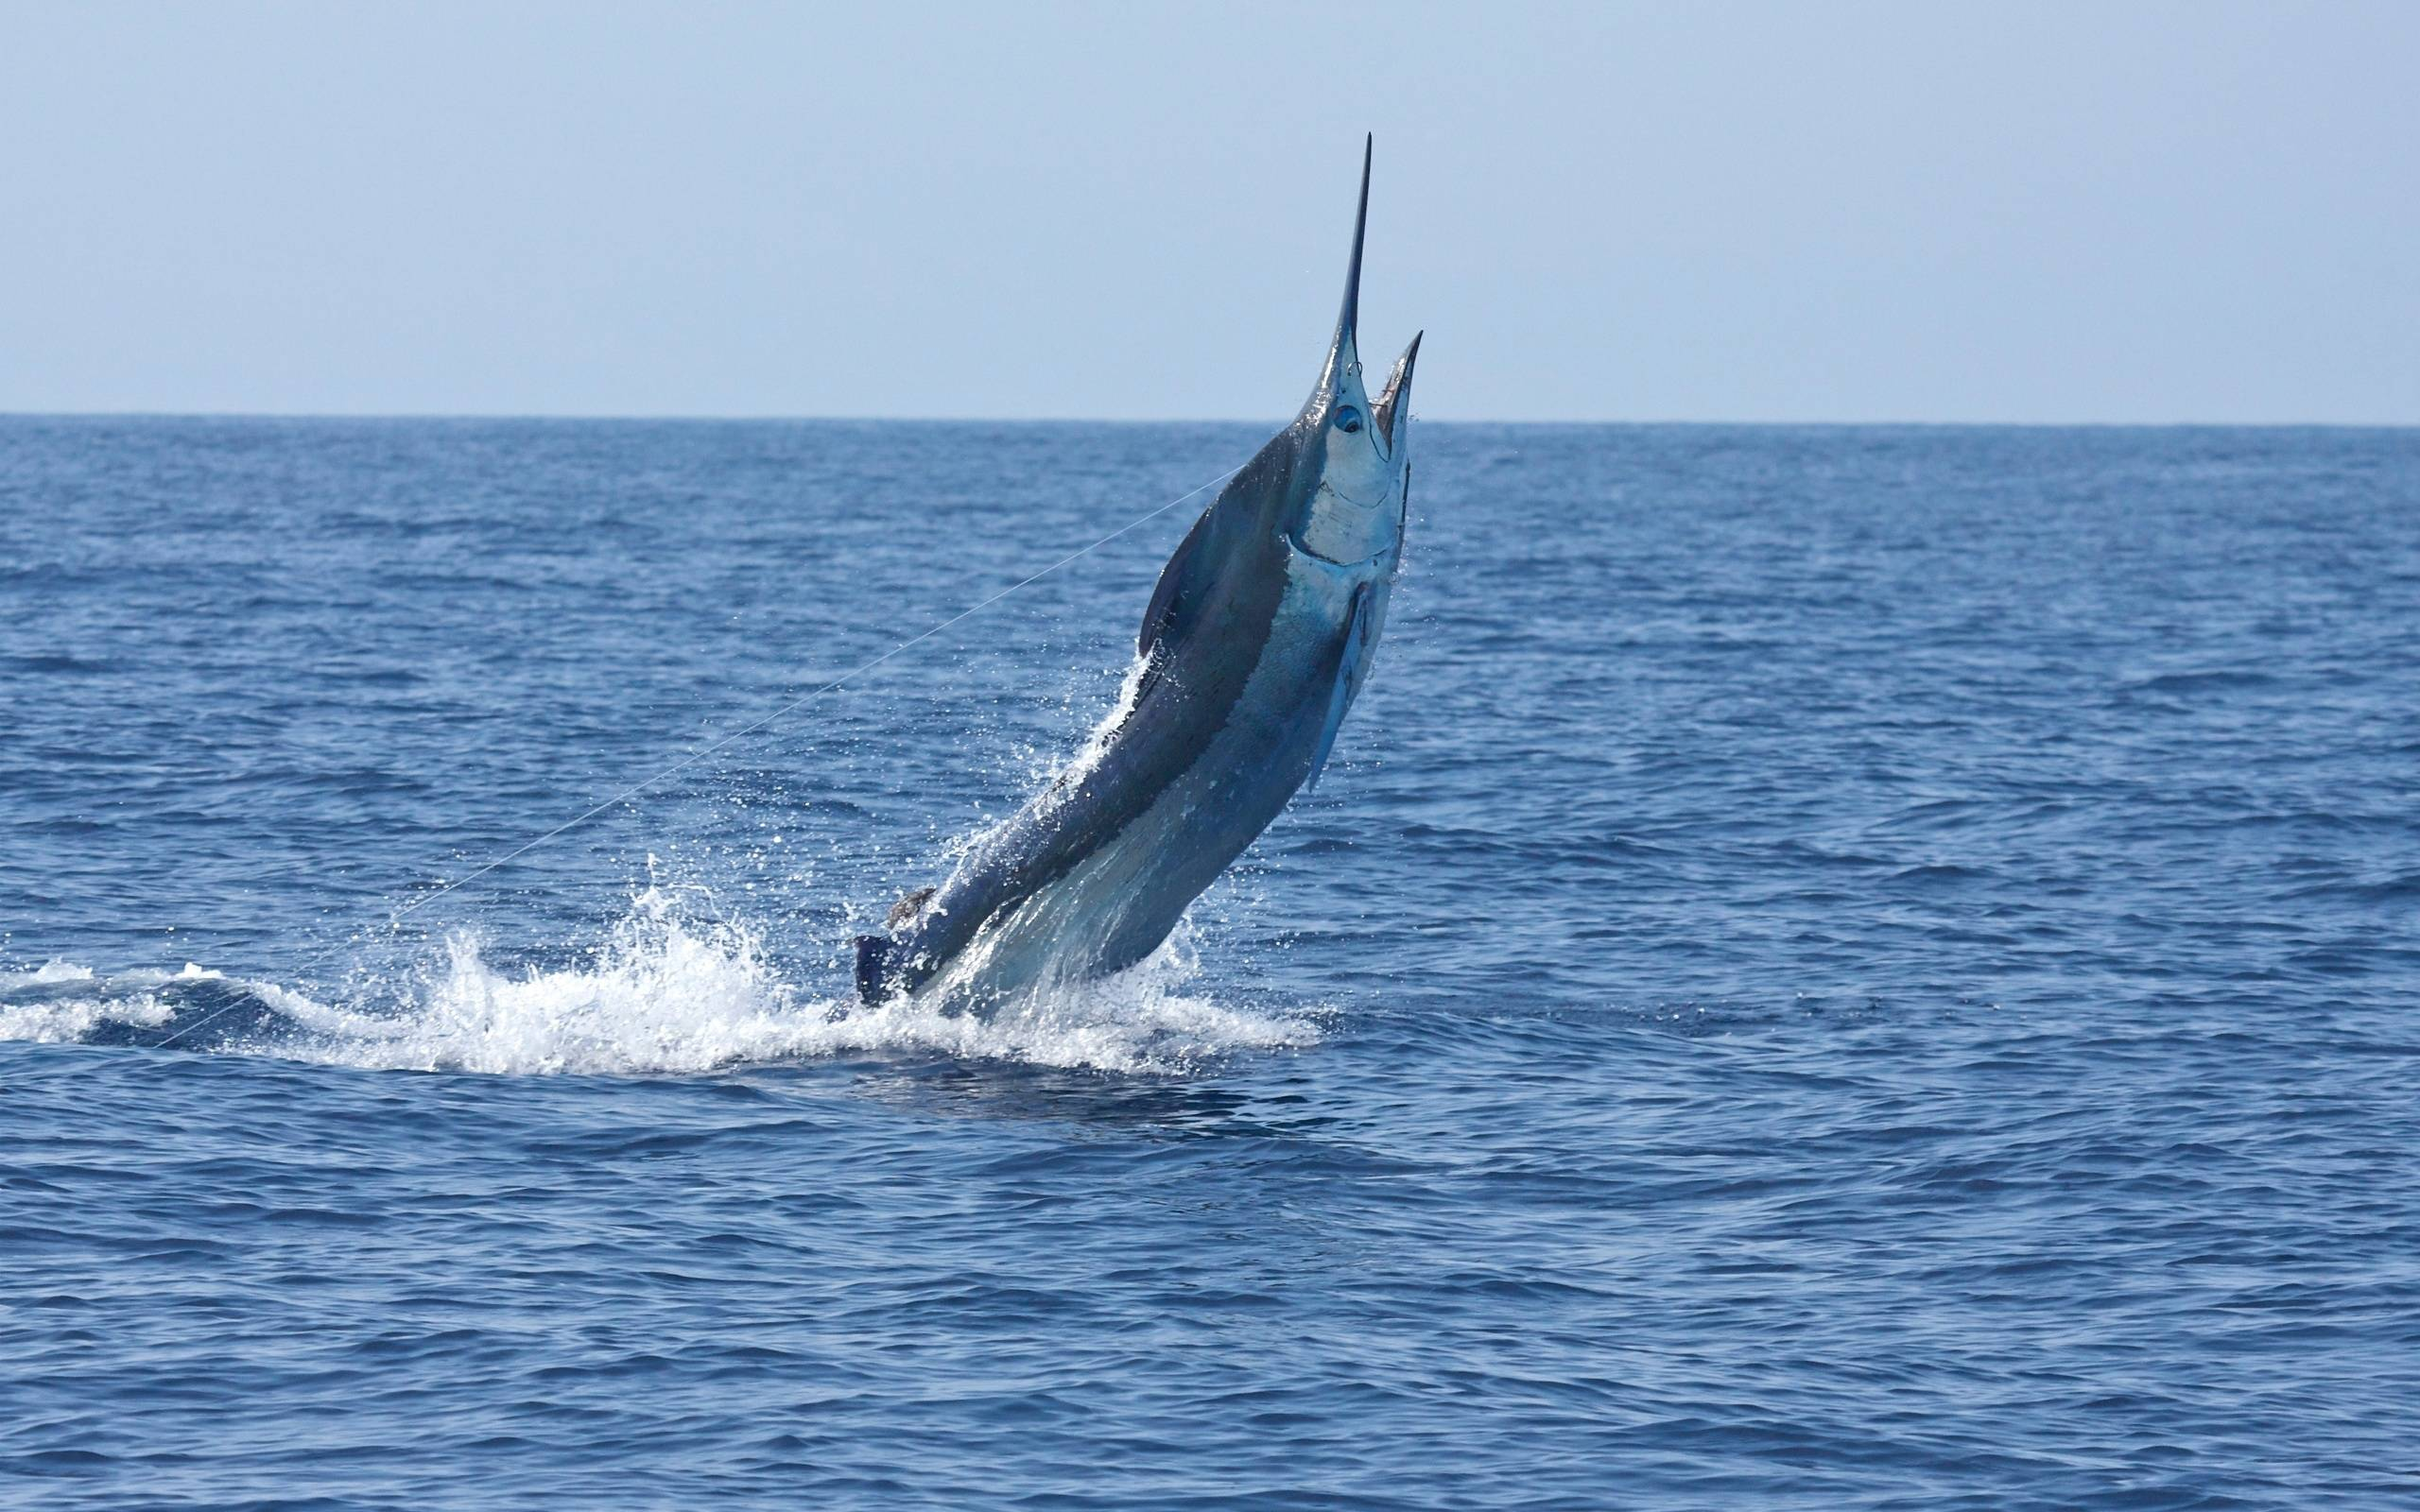 Рыба атлантический голубой марлин – мечта азартного рыбака